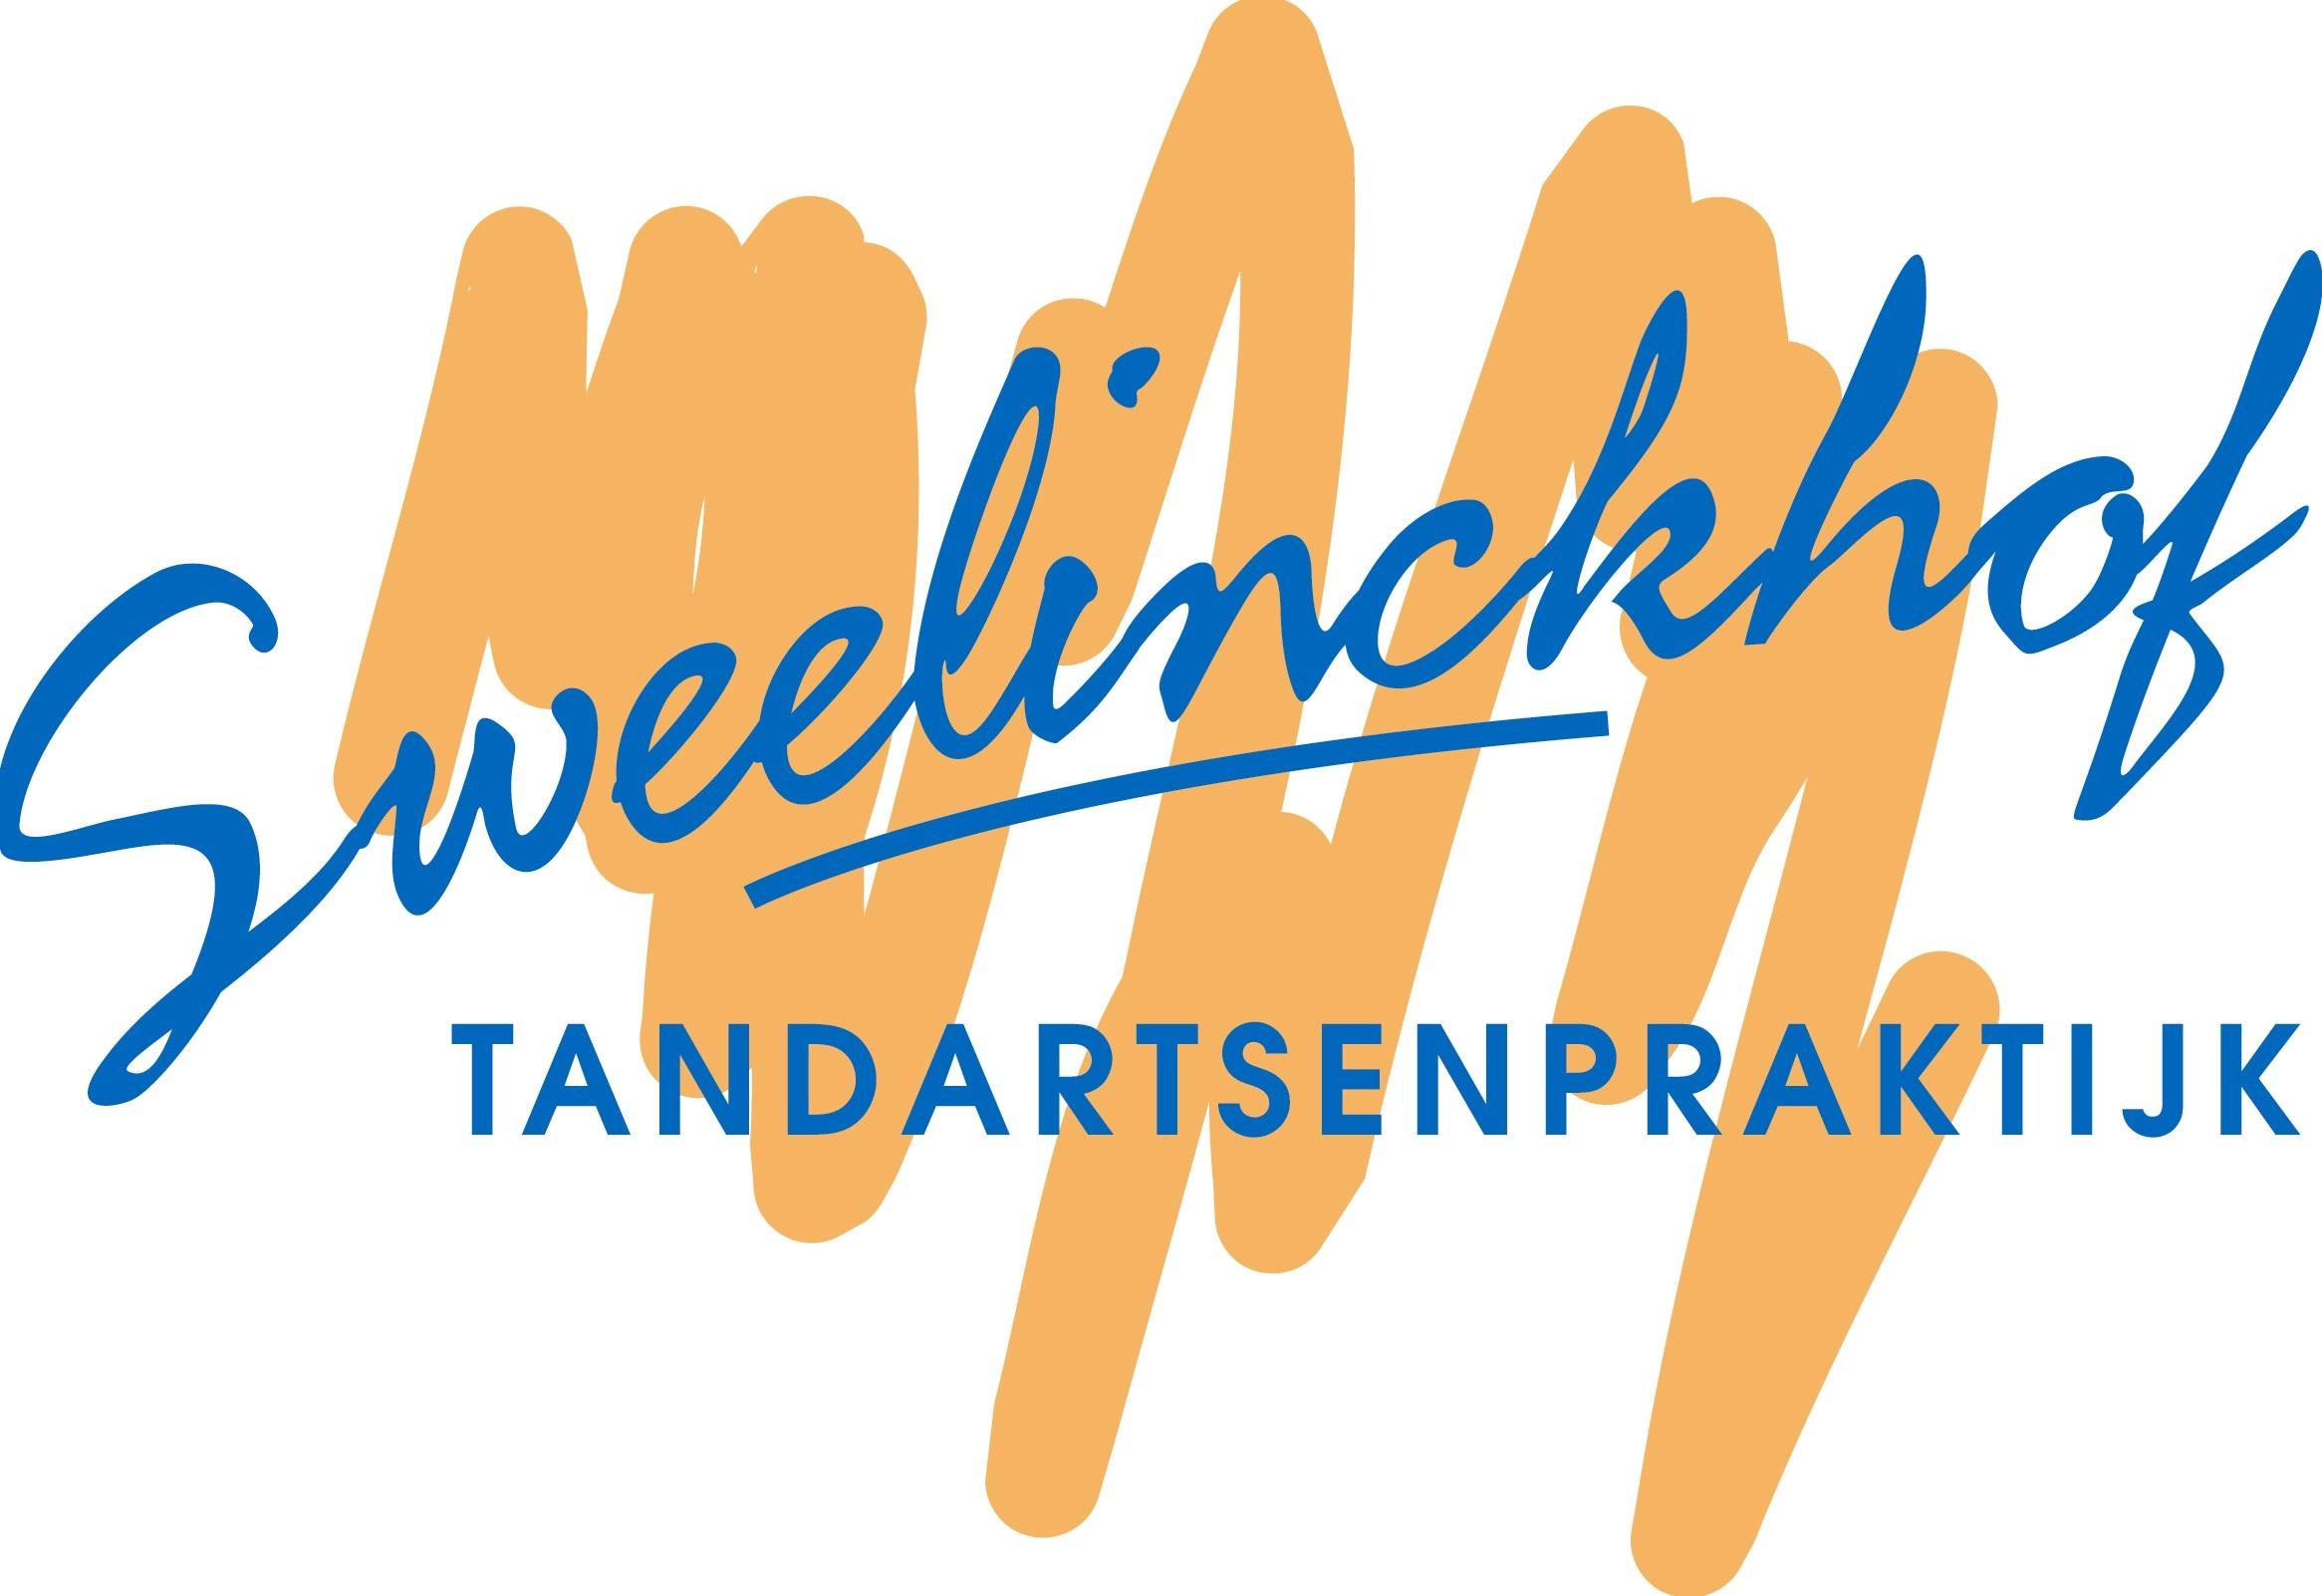 Tandartsenpraktijk Sweelinckhof